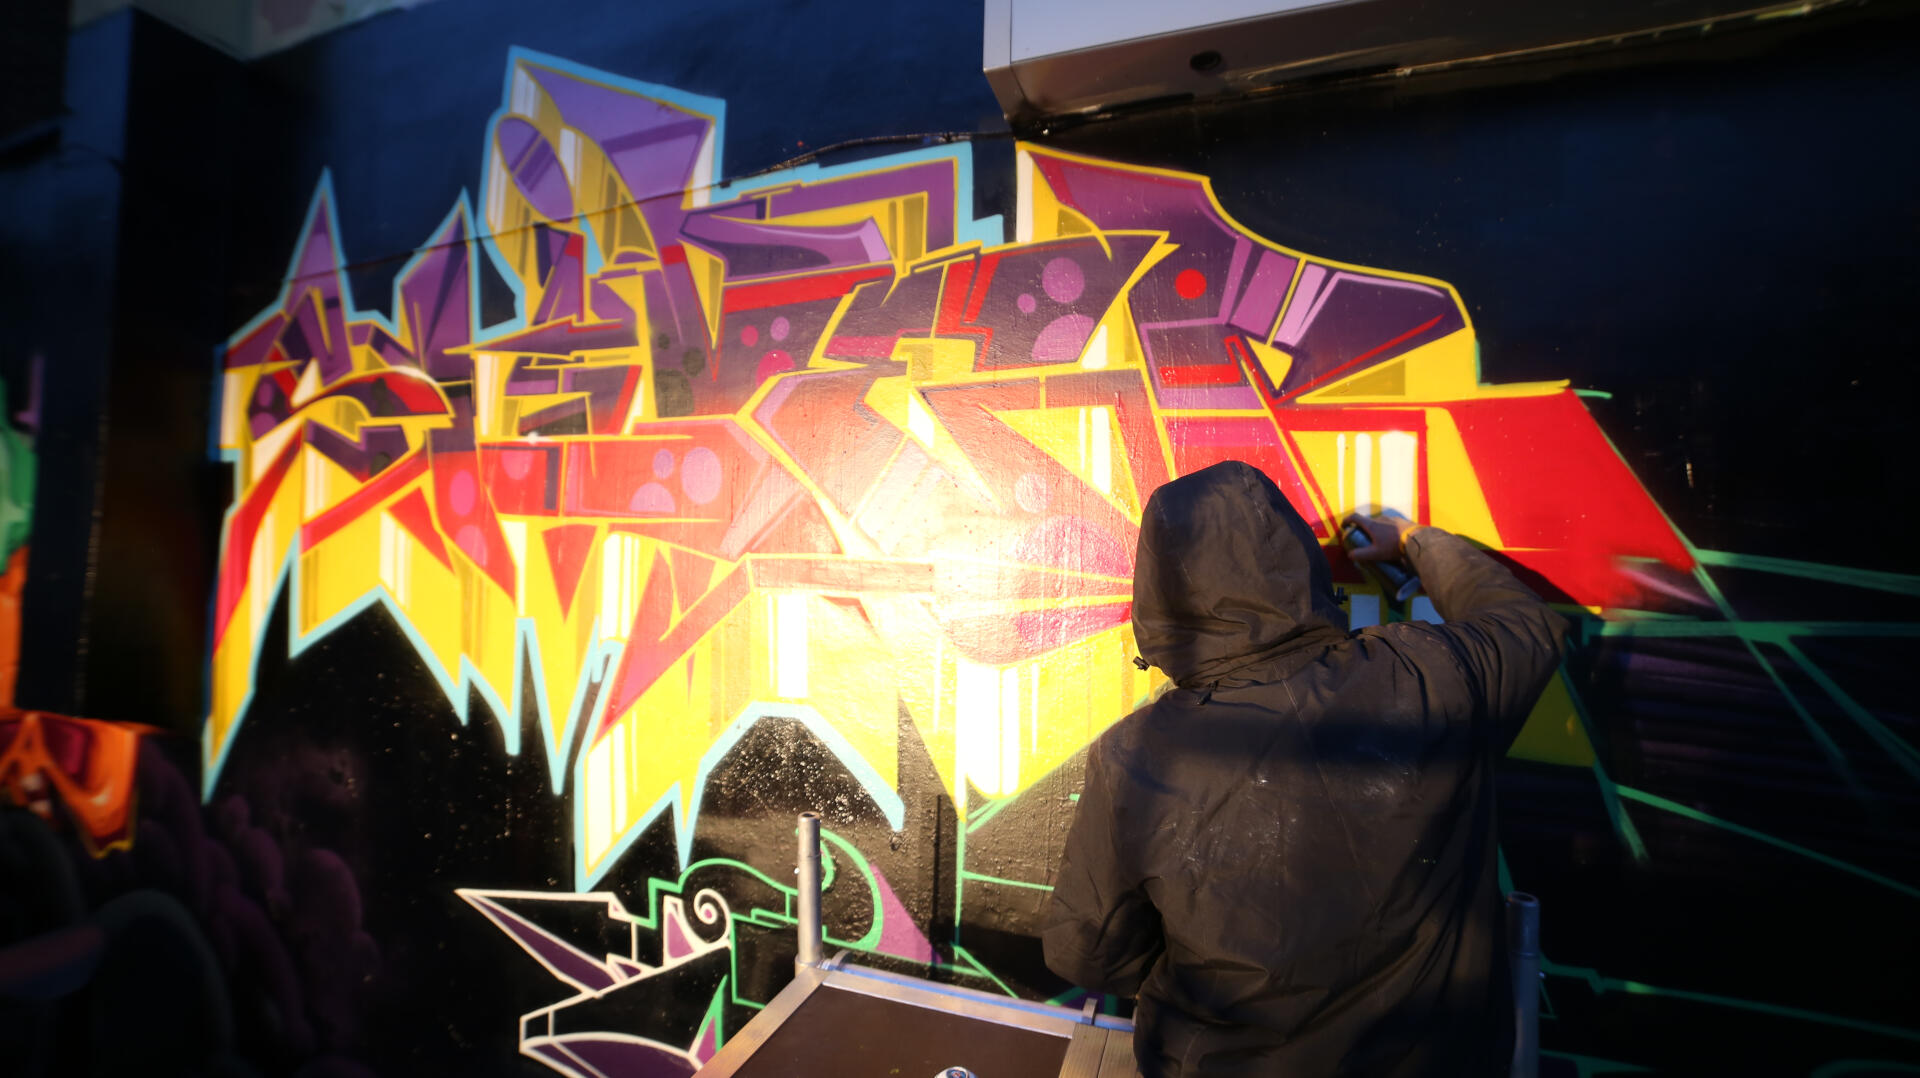 #BIG7 – Battle International de Graffiti – Lille – Le Film